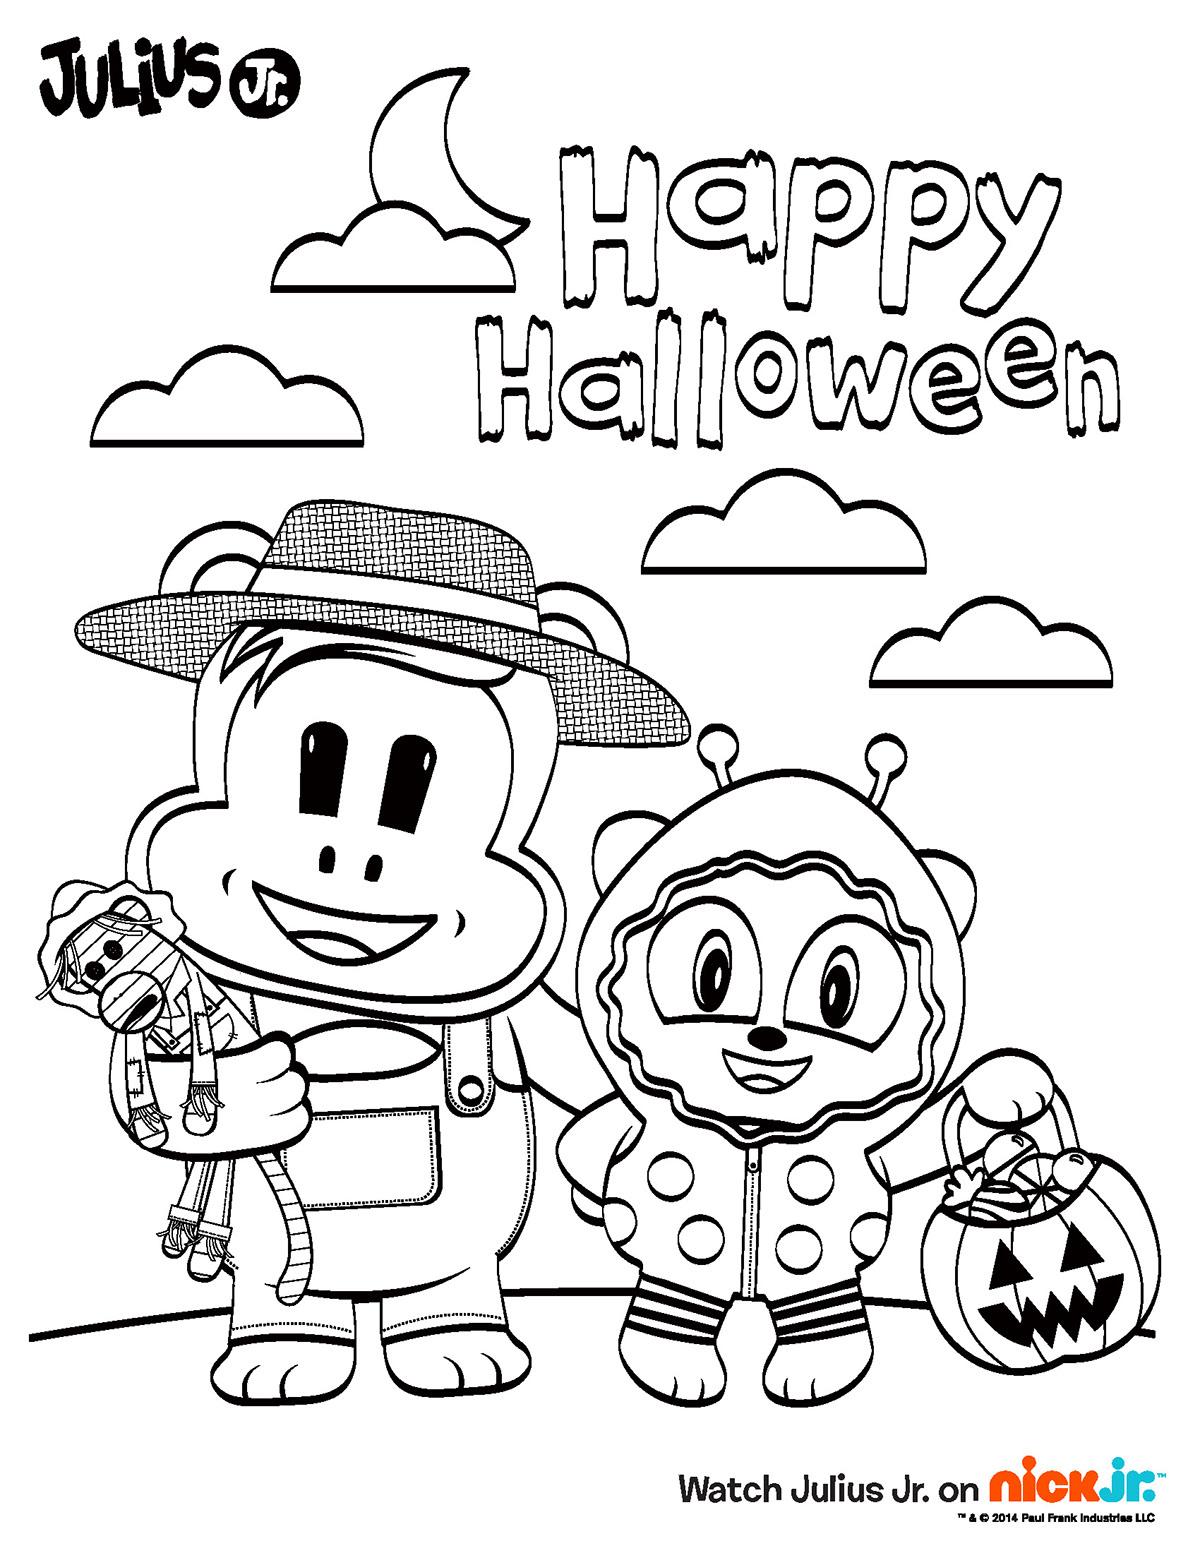 Coloring pages nick jr - Coloring Pages Nick Jr